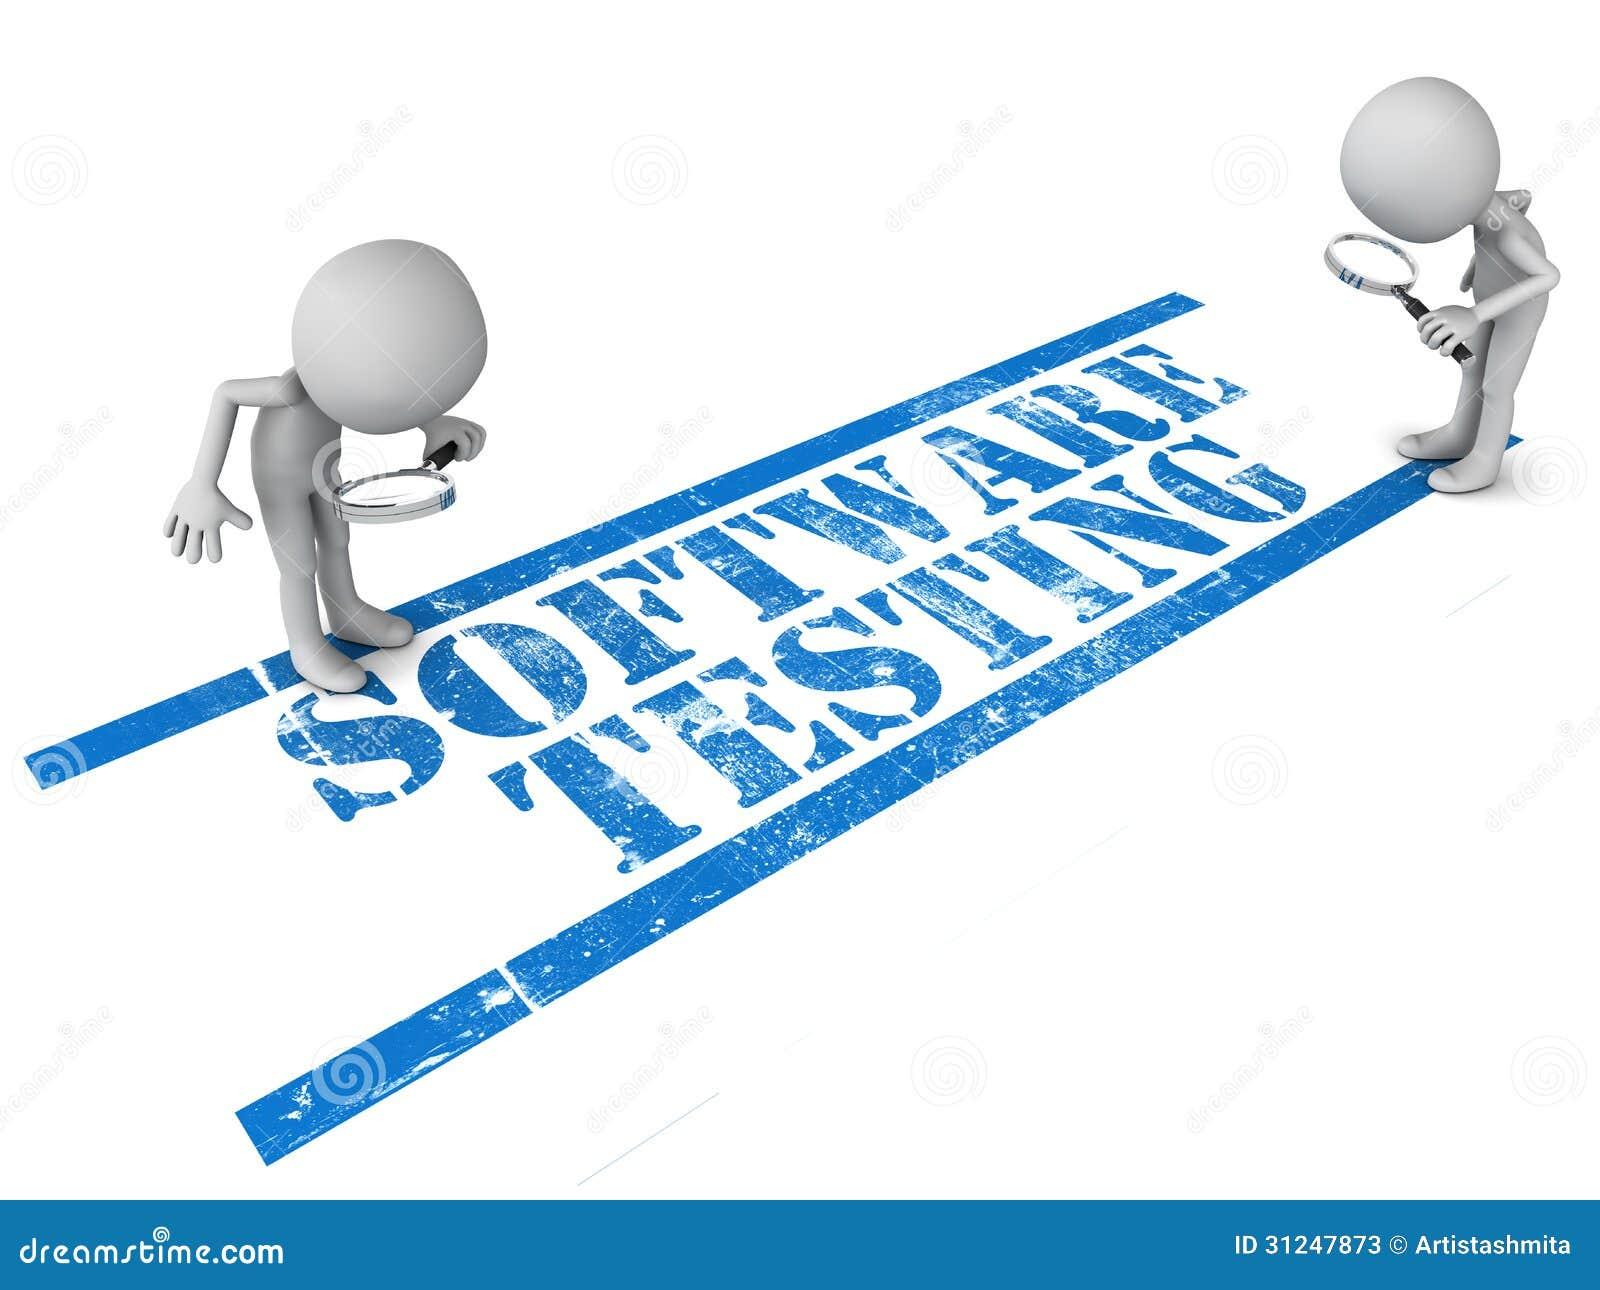 Software Testing Stock Photos - Image: 31247873